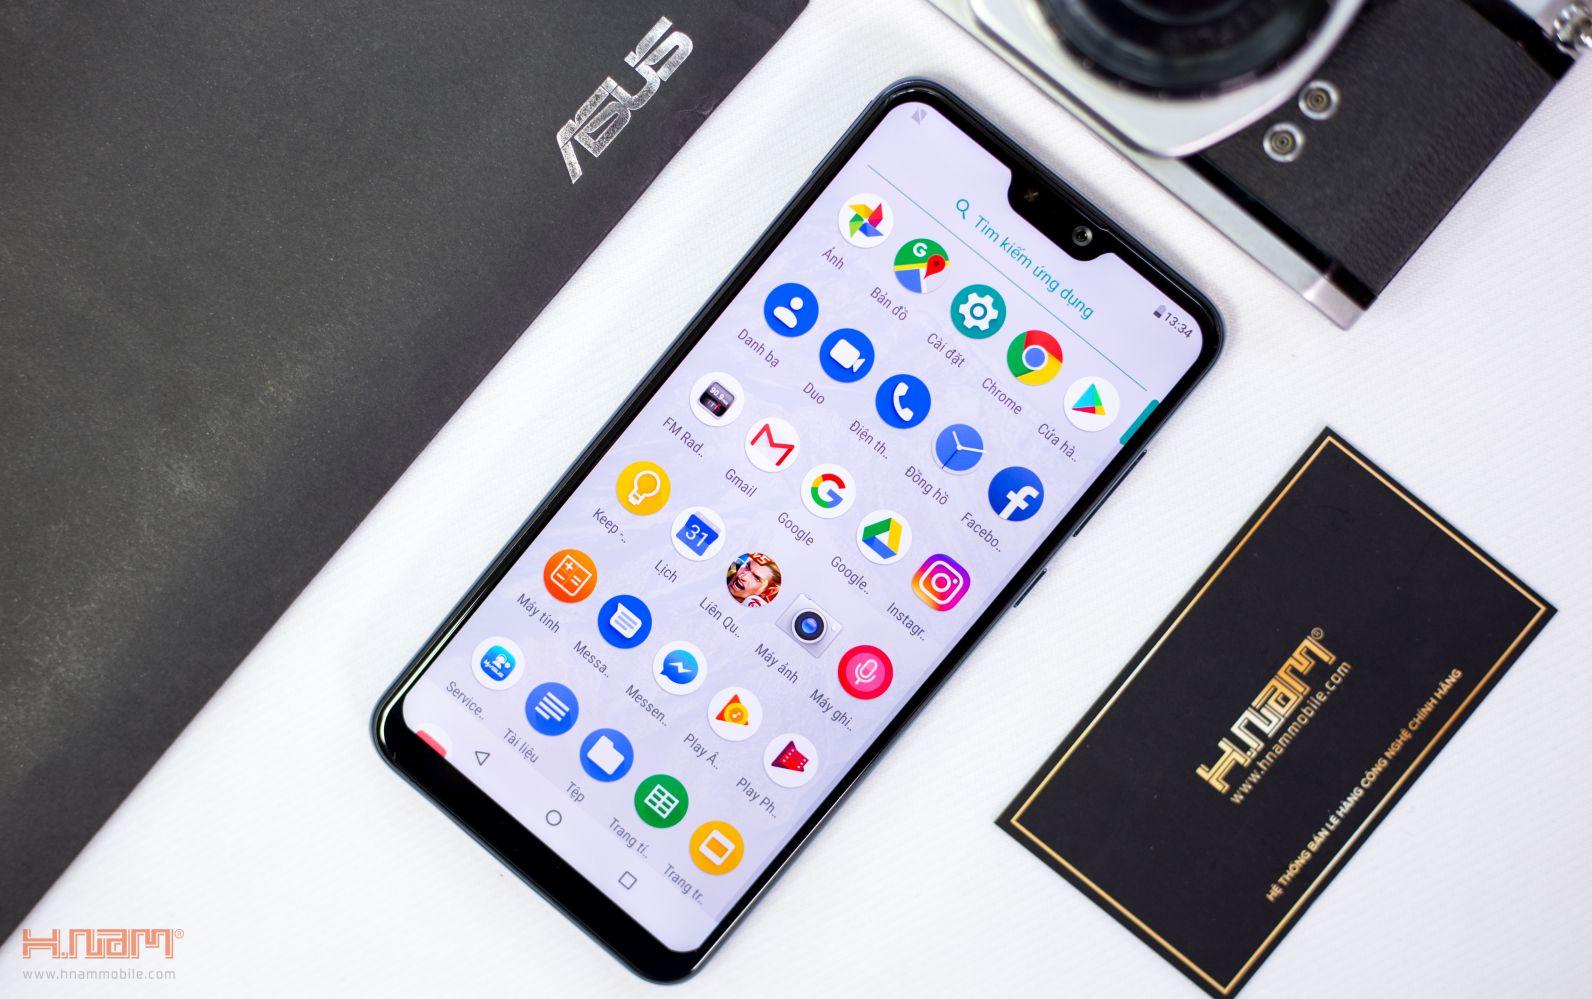 Trên tay Zenfone Max Pro M2: Snapdragon 660, pin 5000mAh, 5.29 triệu hình 11